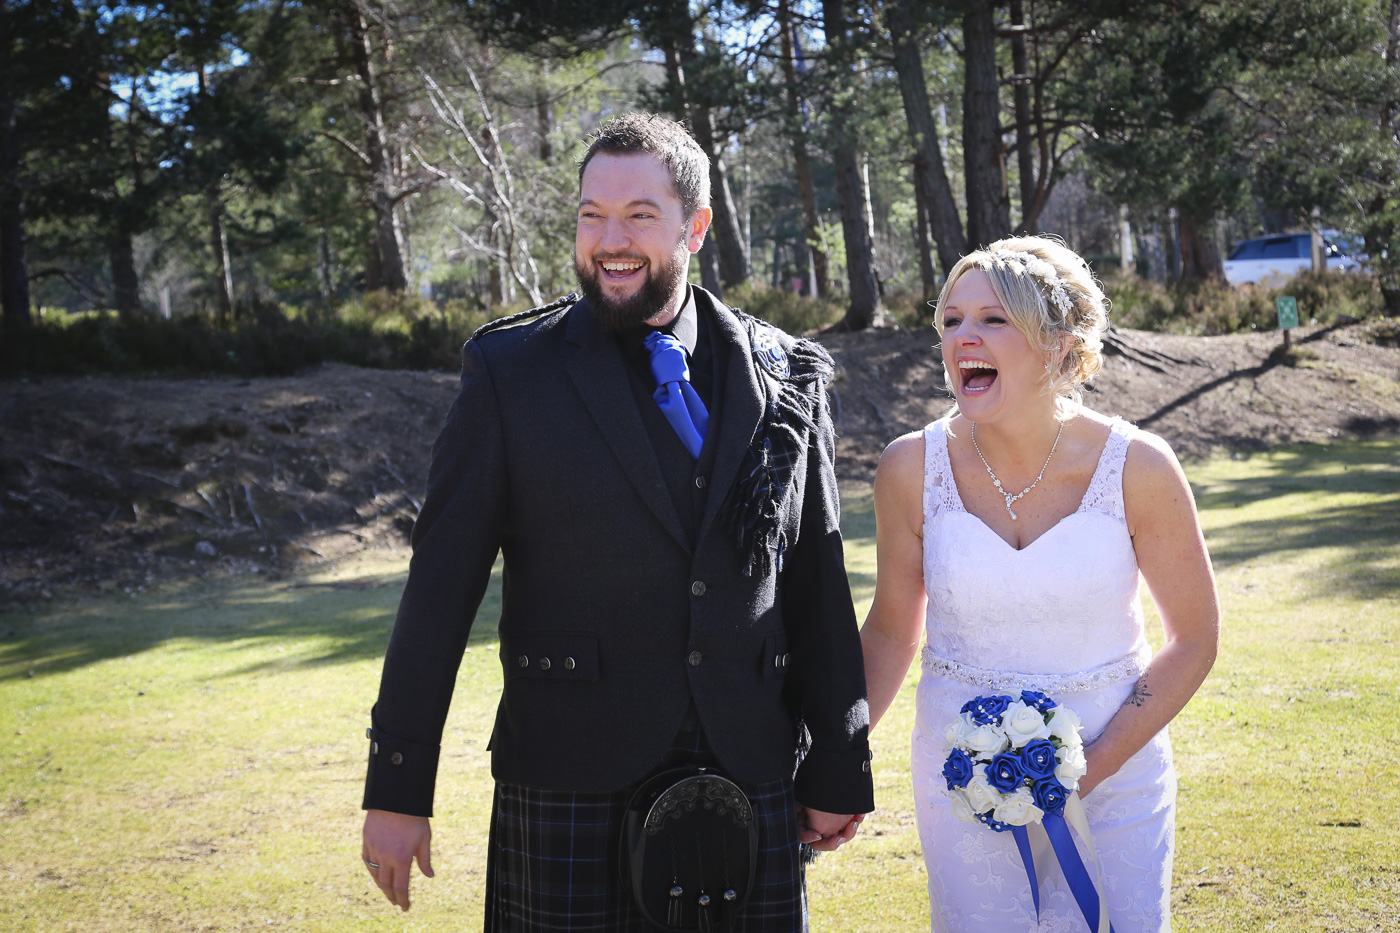 Wedding photography at The Hilton Coylumbridge and Loch Morlich-9982